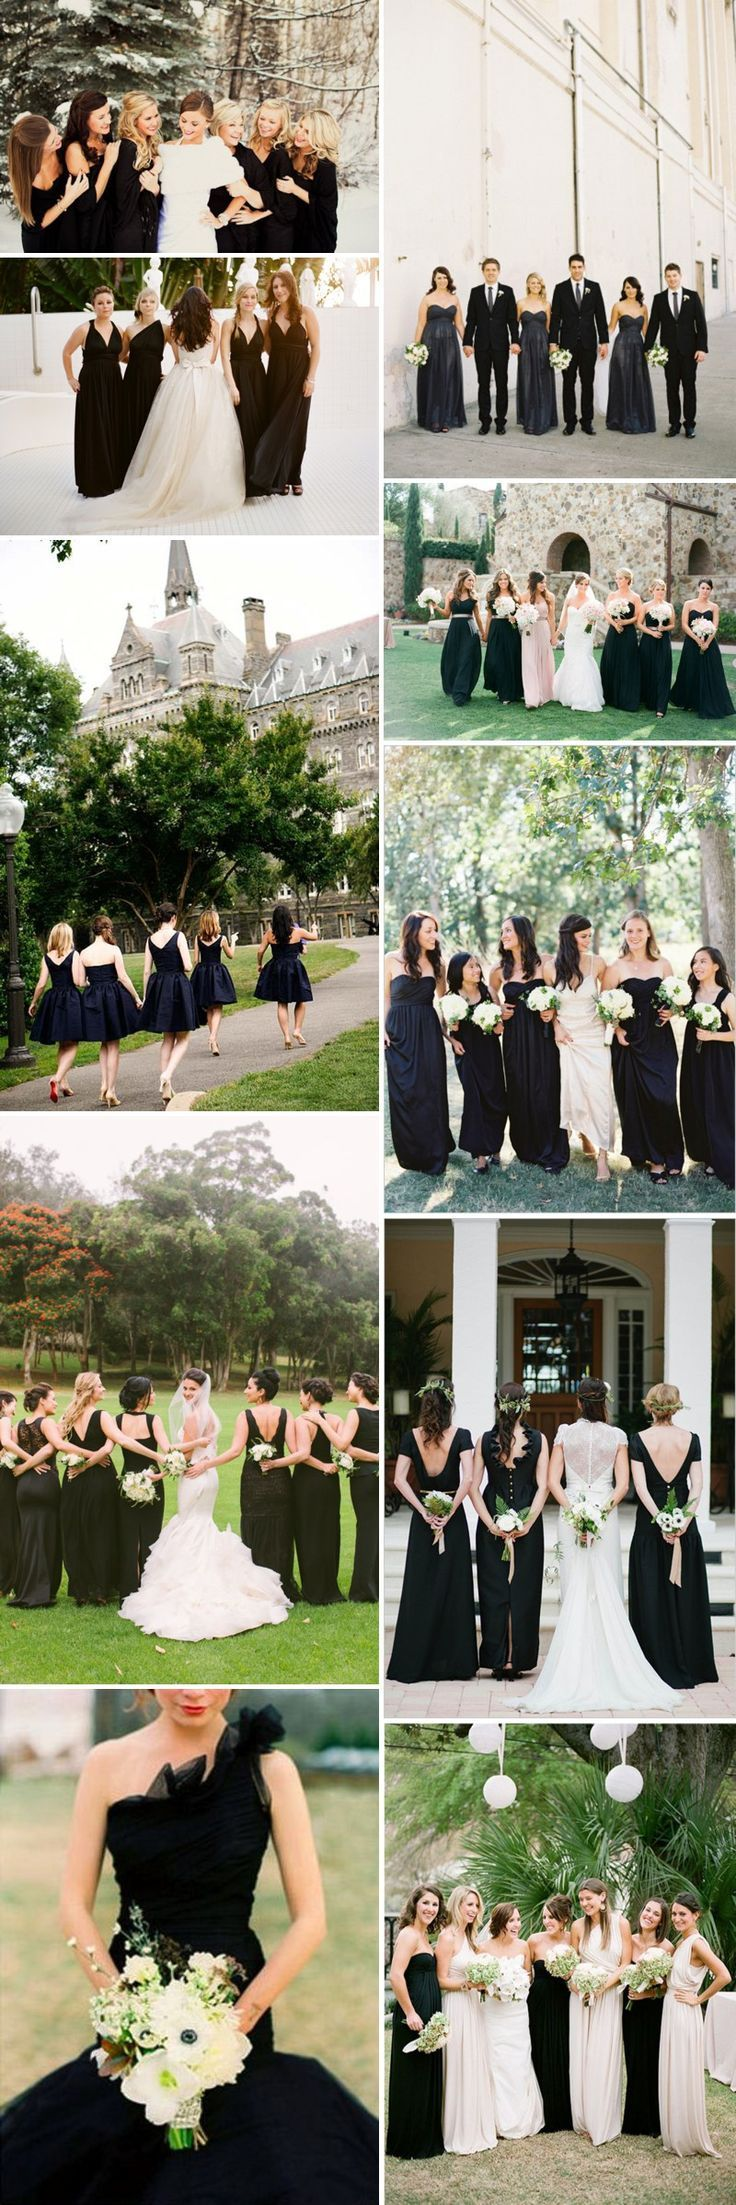 best WISH images on Pinterest Gown wedding Groom attire